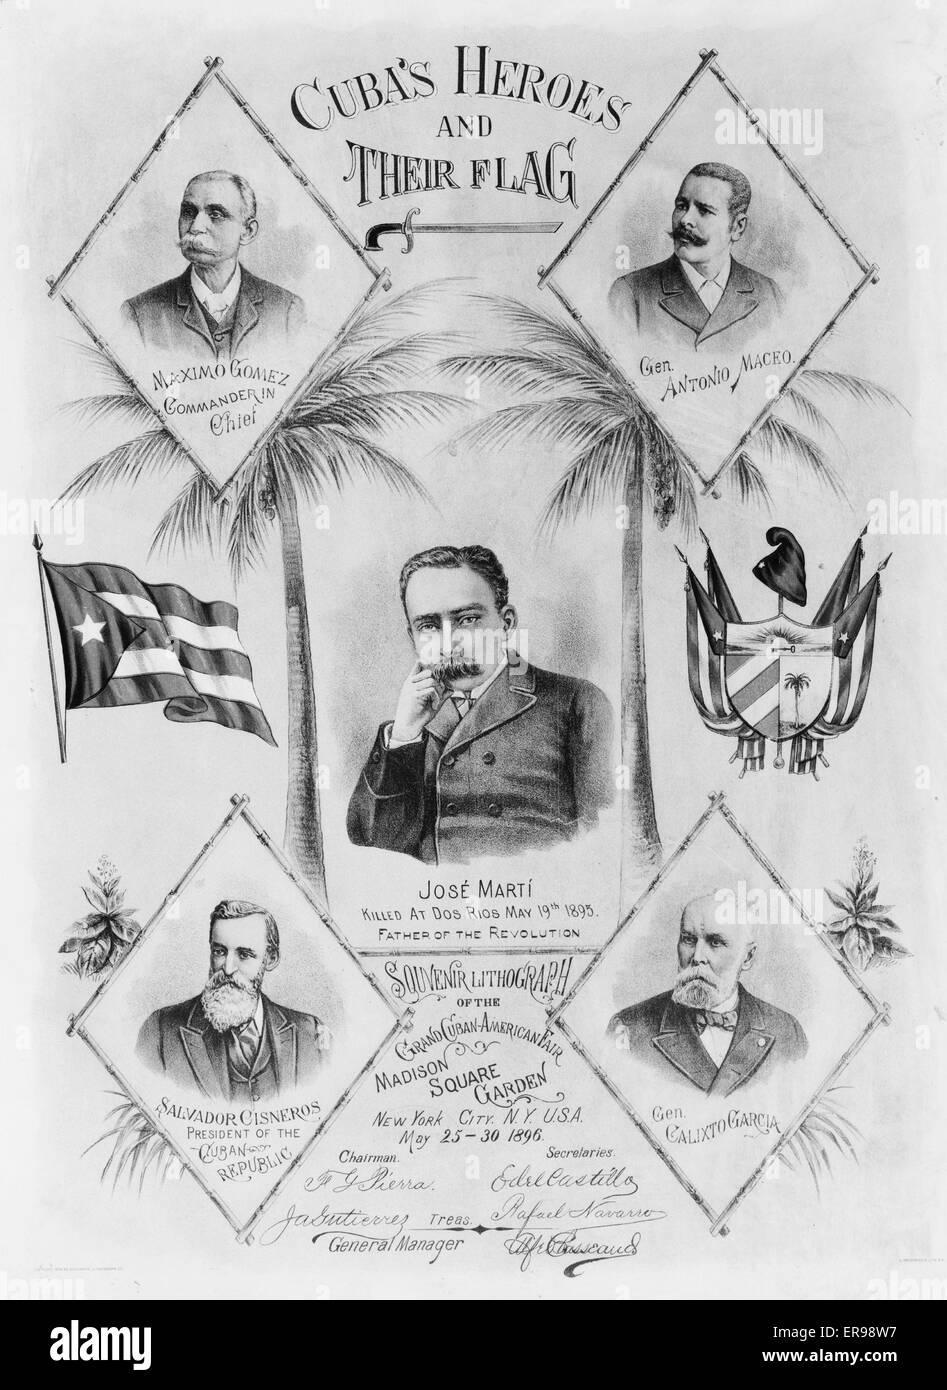 Cuba's heroes and their flag. Portraits of Maximo Gomez, Gen. Antonio Maceo, Josae Marta, Salvador Cisneros, - Stock Image